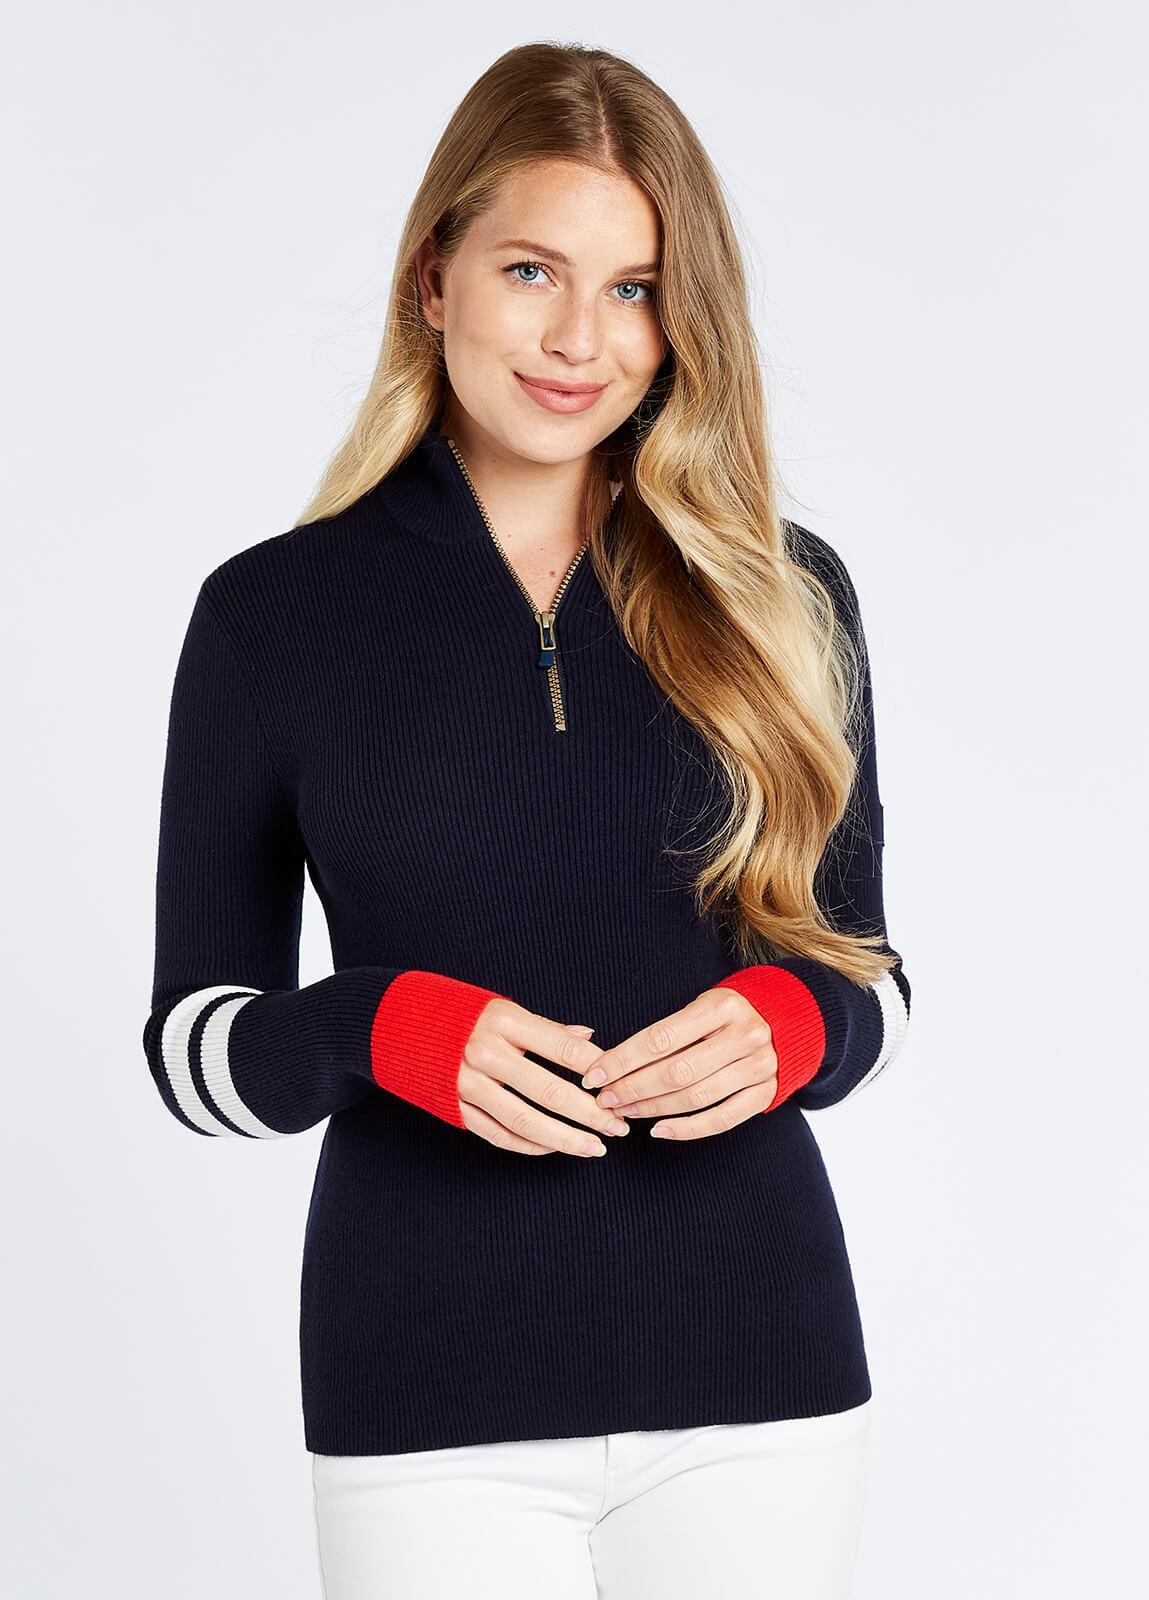 Barleycove Sweater - Navy